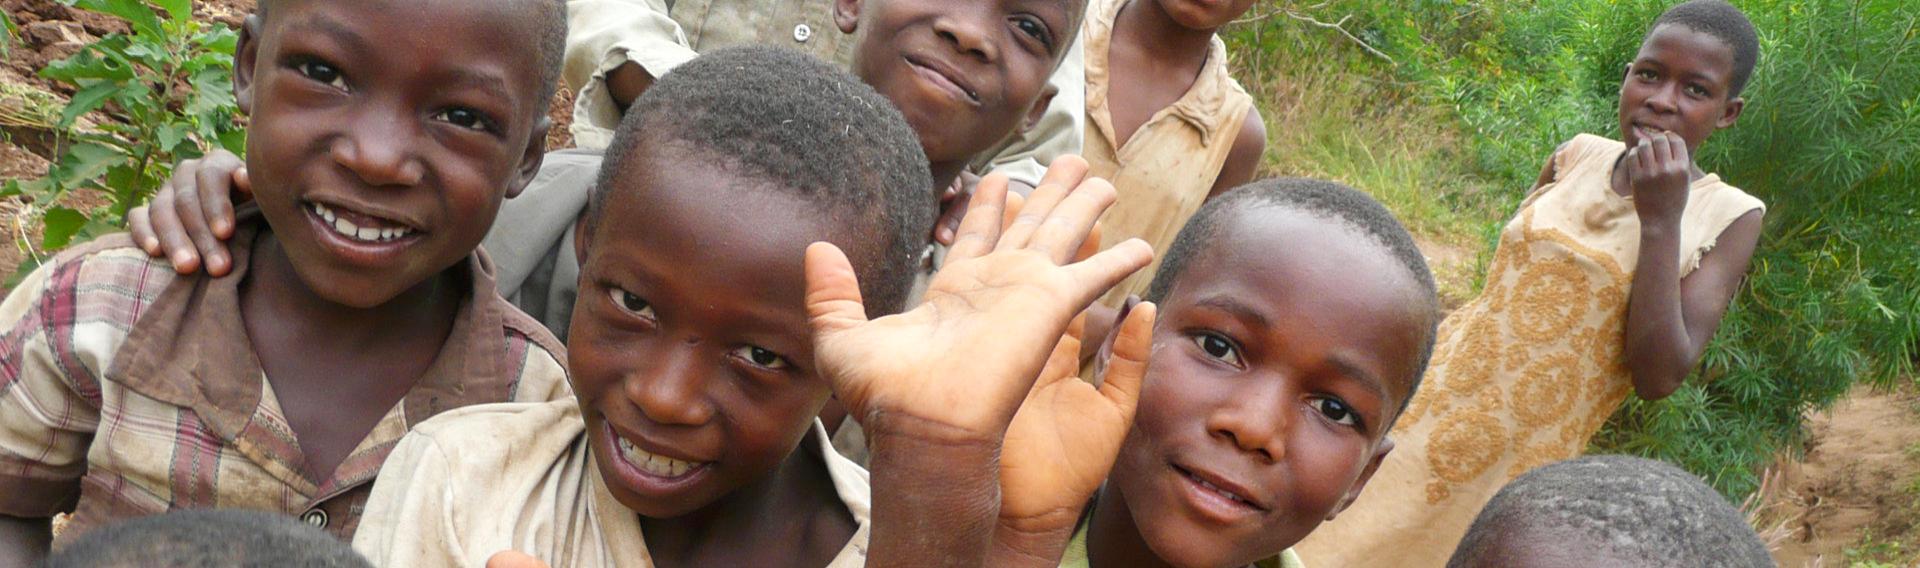 african kids